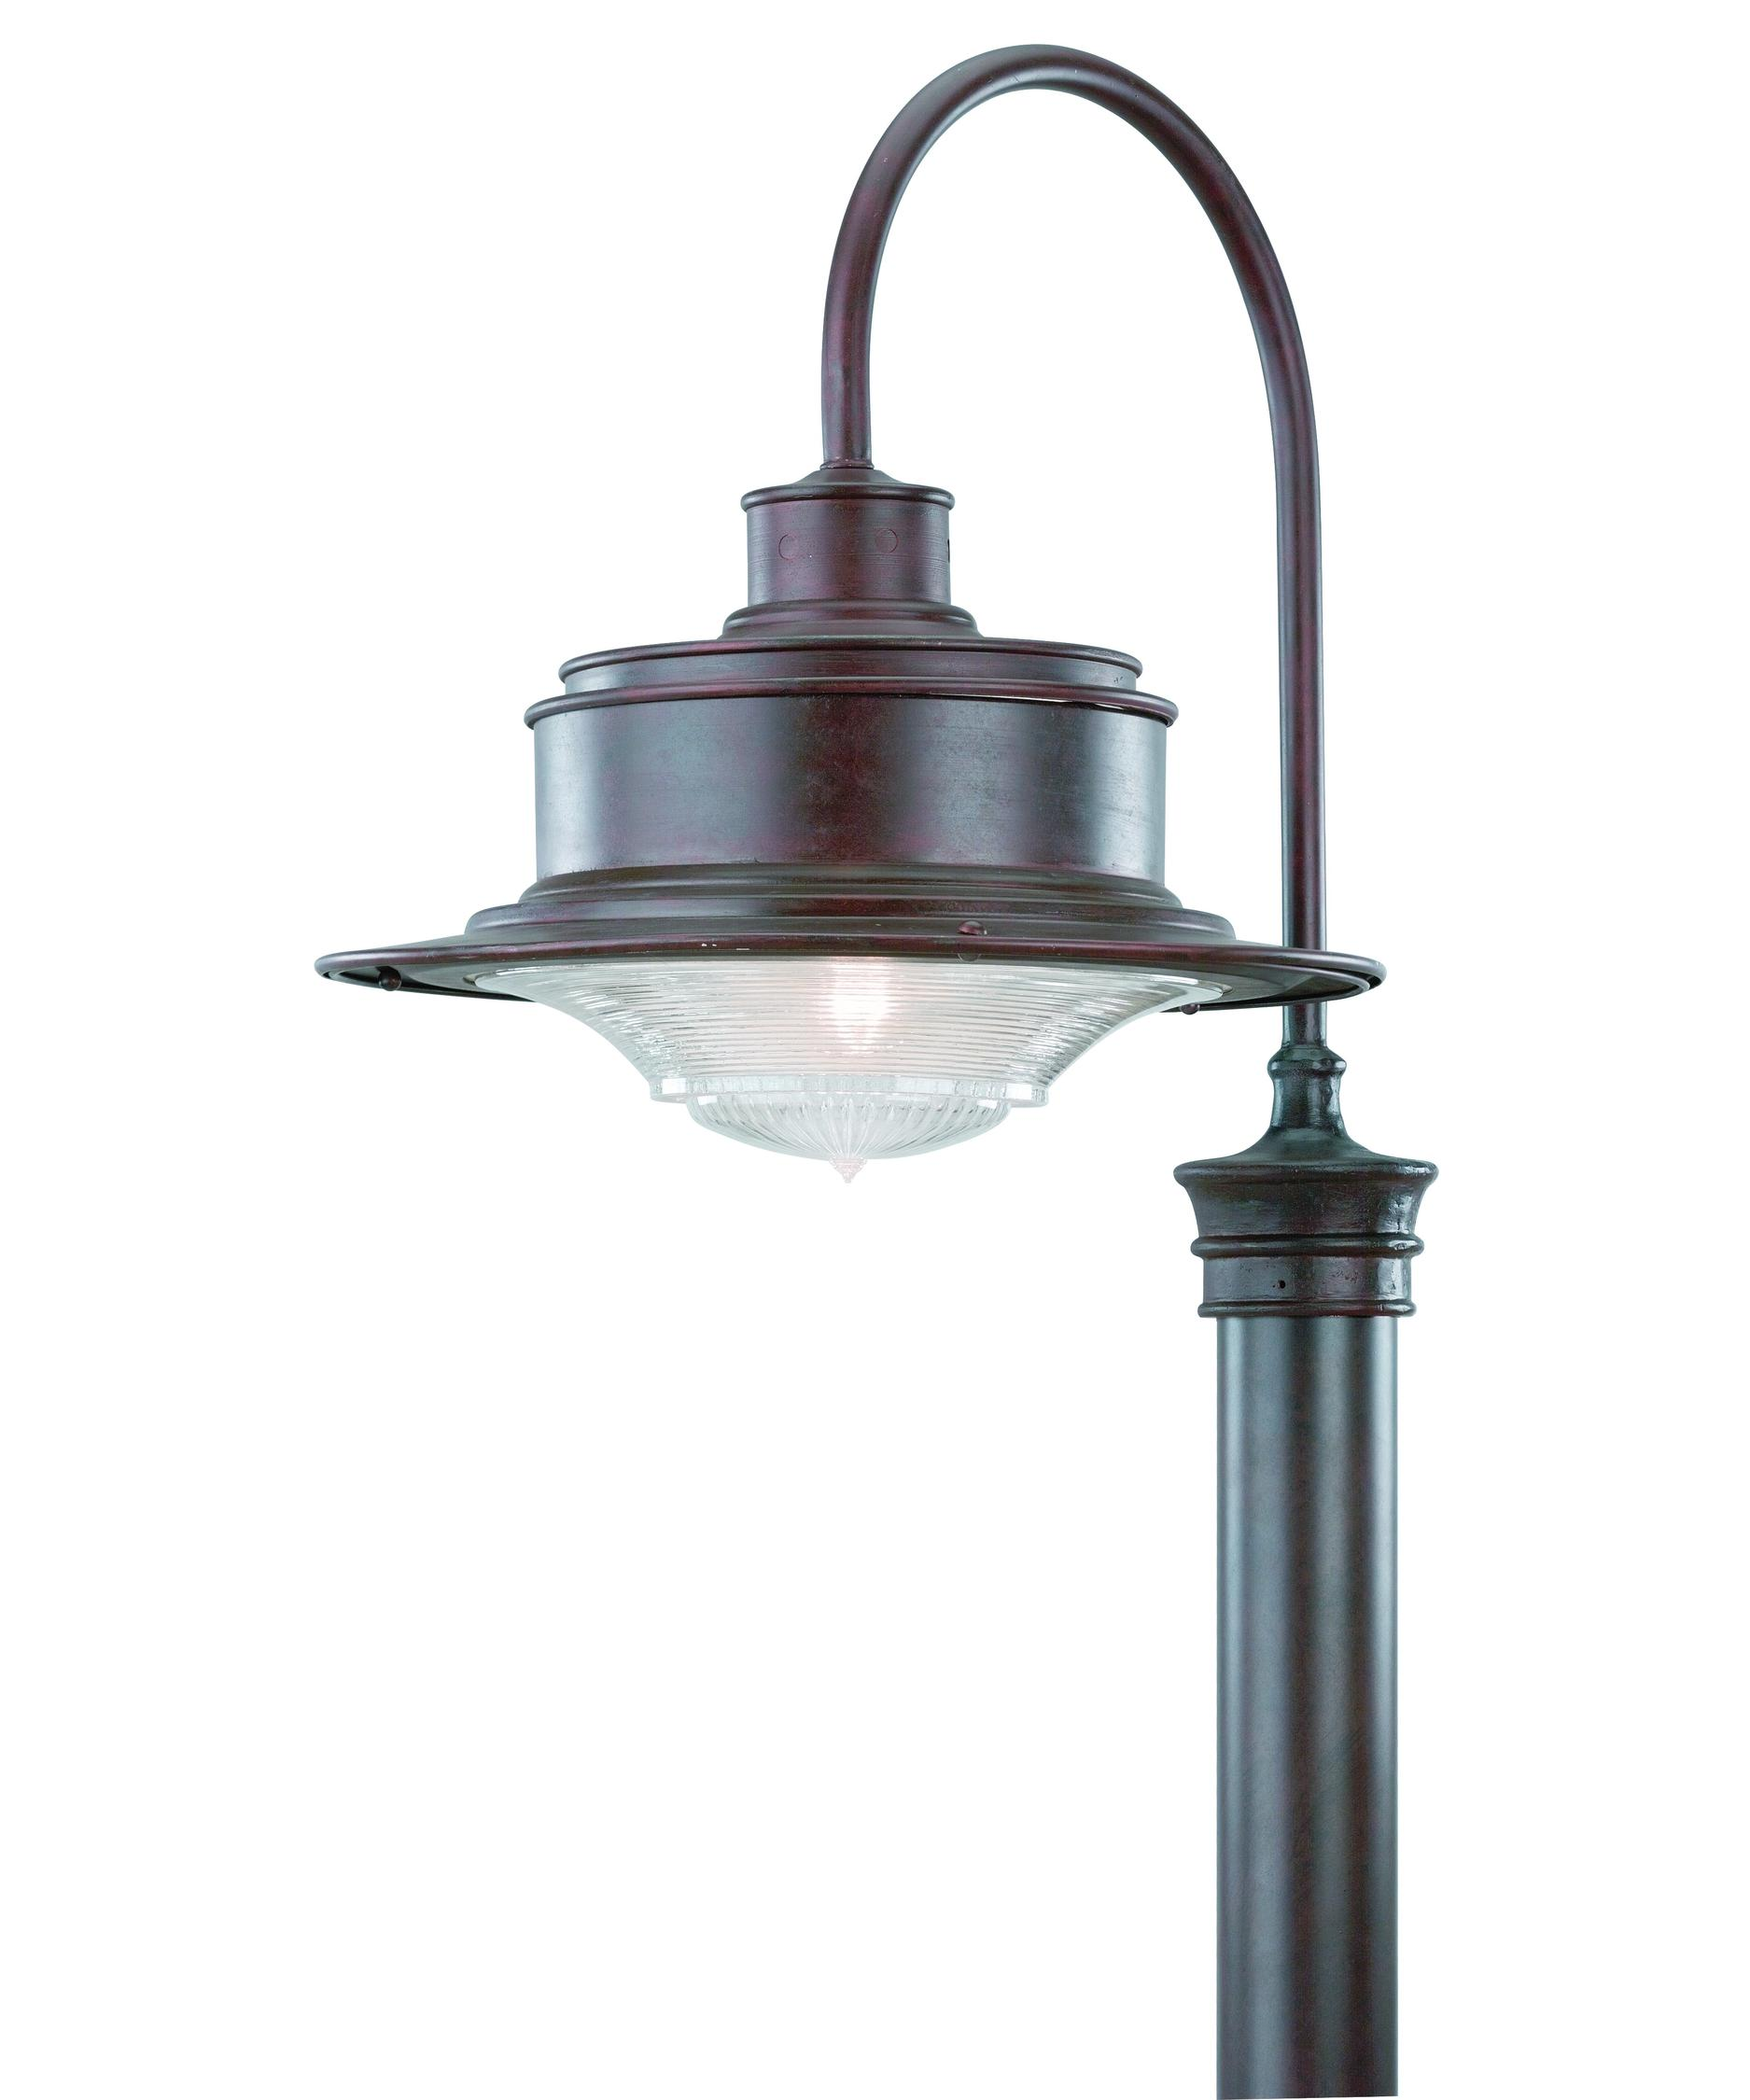 Outdoor Post Lighting Brimfield 3 Head Aged Iron Outdoor Post